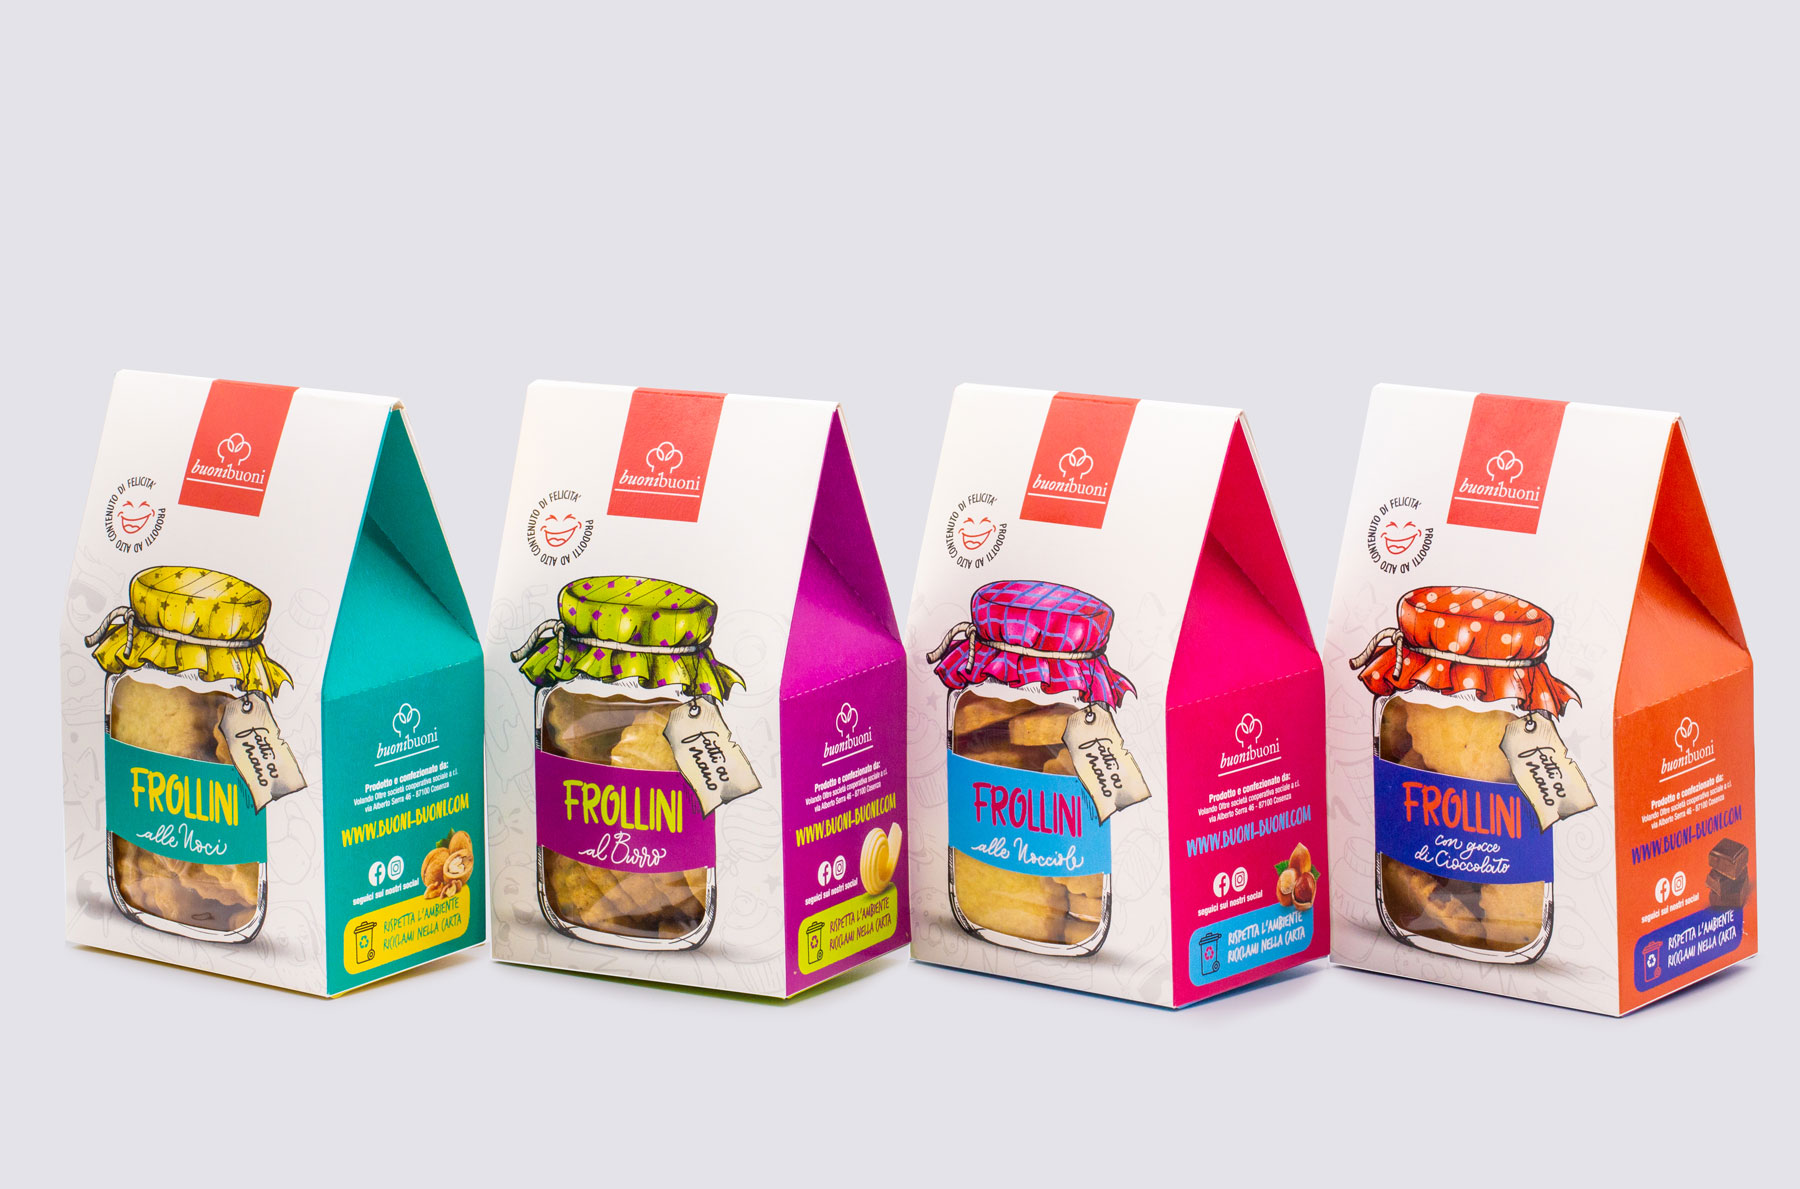 Studio La Regina Created Packaging Design for BuoniBuoni Shortbread Range